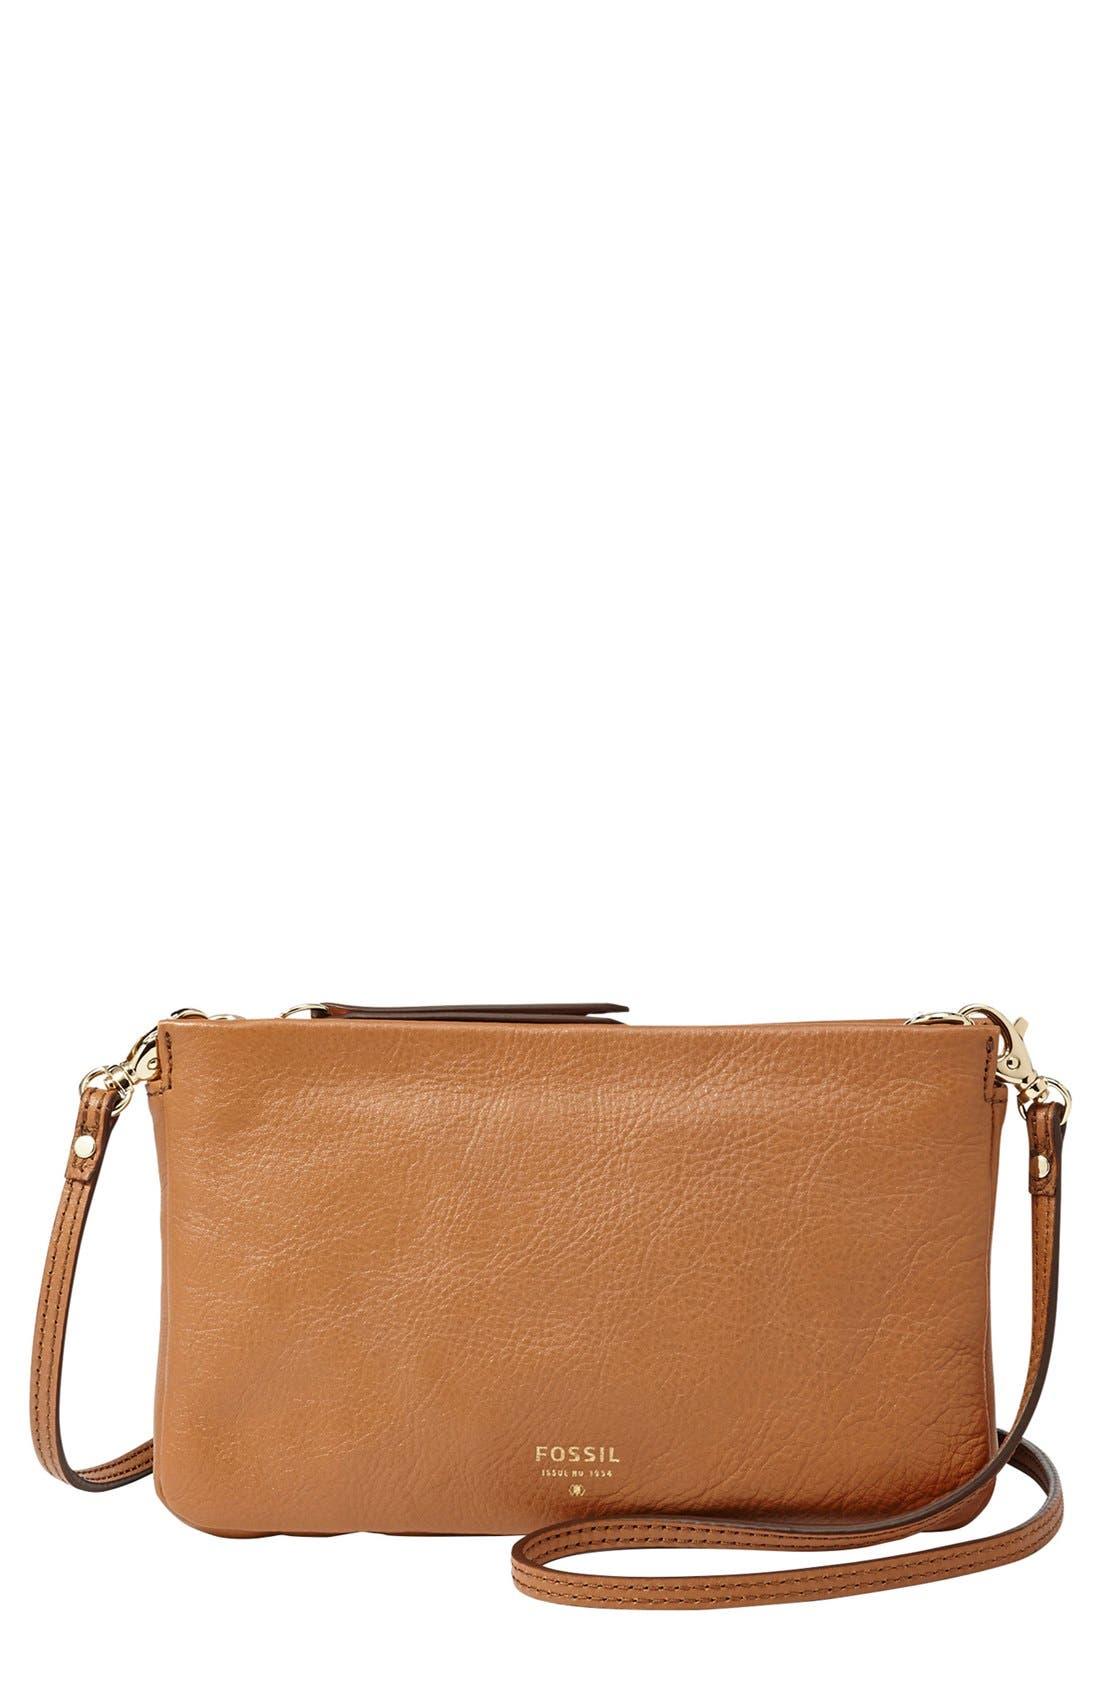 Main Image - Fossil 'Mini' Crossbody Bag